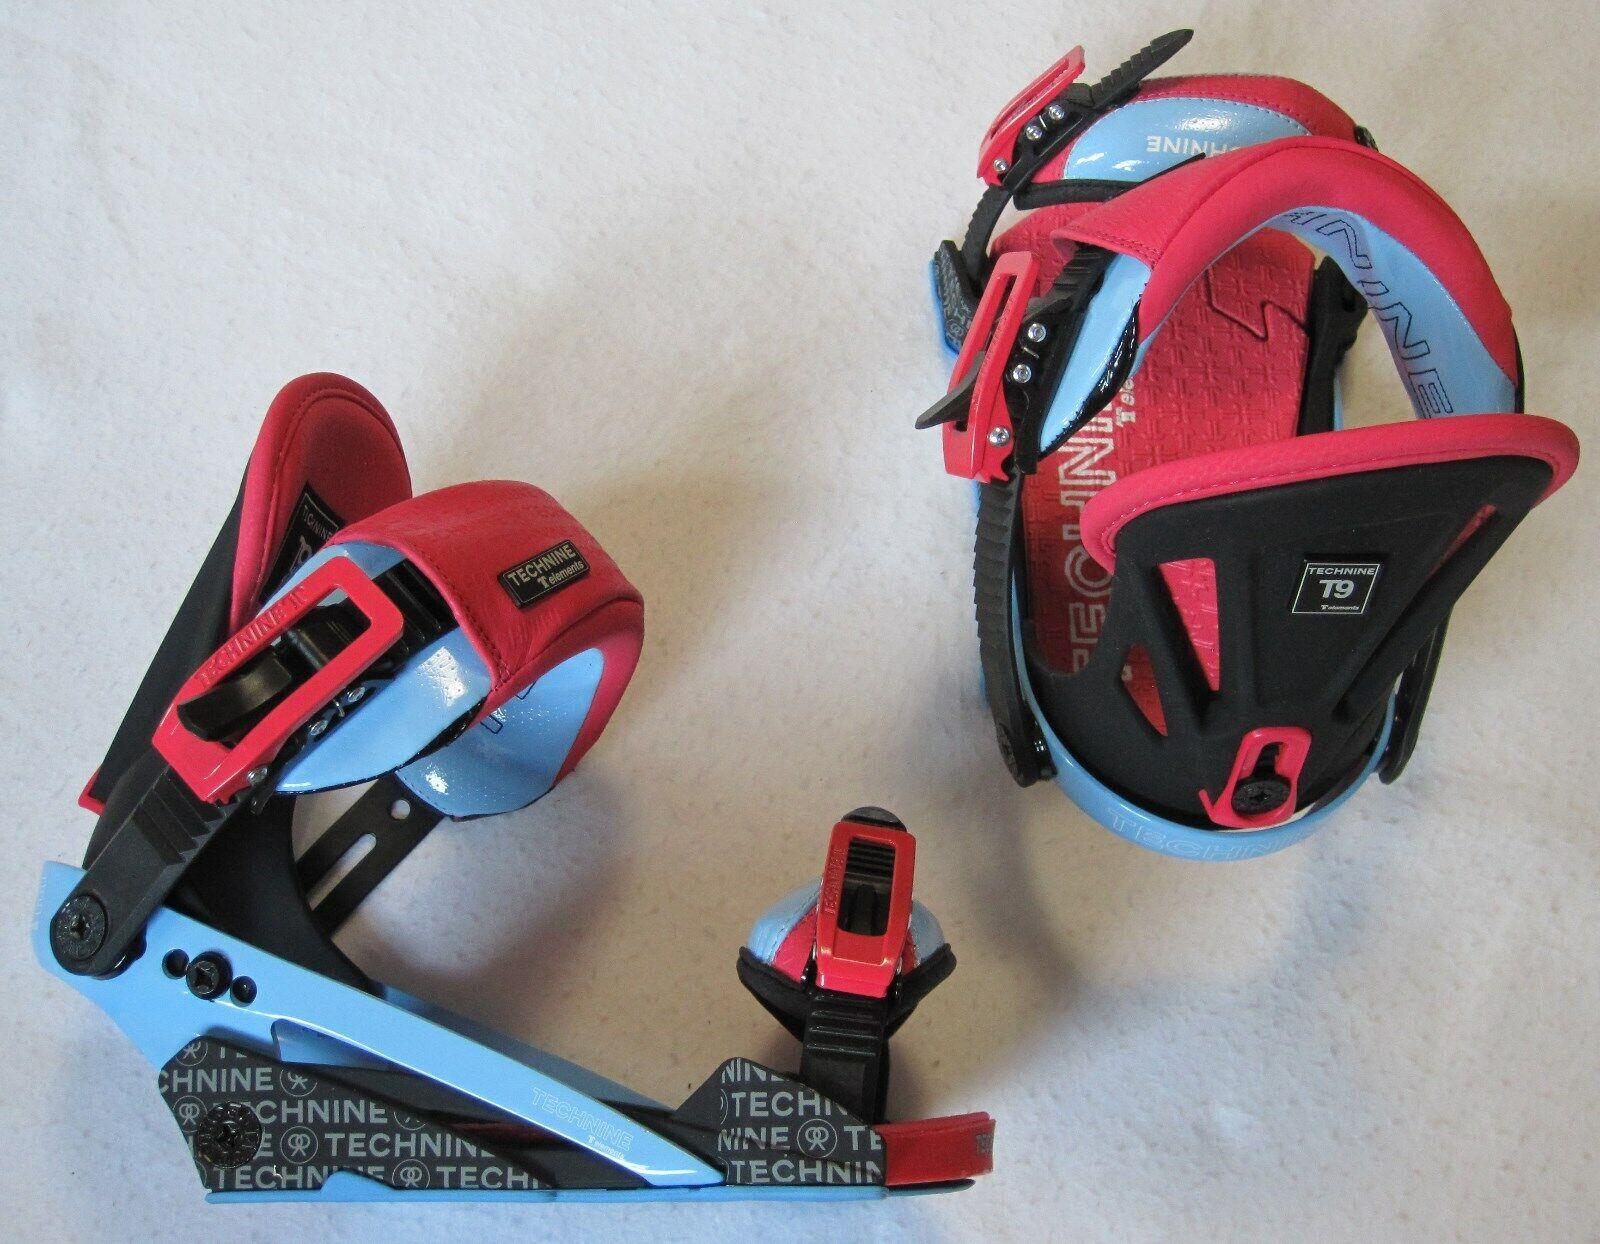 NEW TECHNINE T9  ELEMENTS  damen SNOWBOARD BINDINGS - MEDIUM - rot schwarz Blau